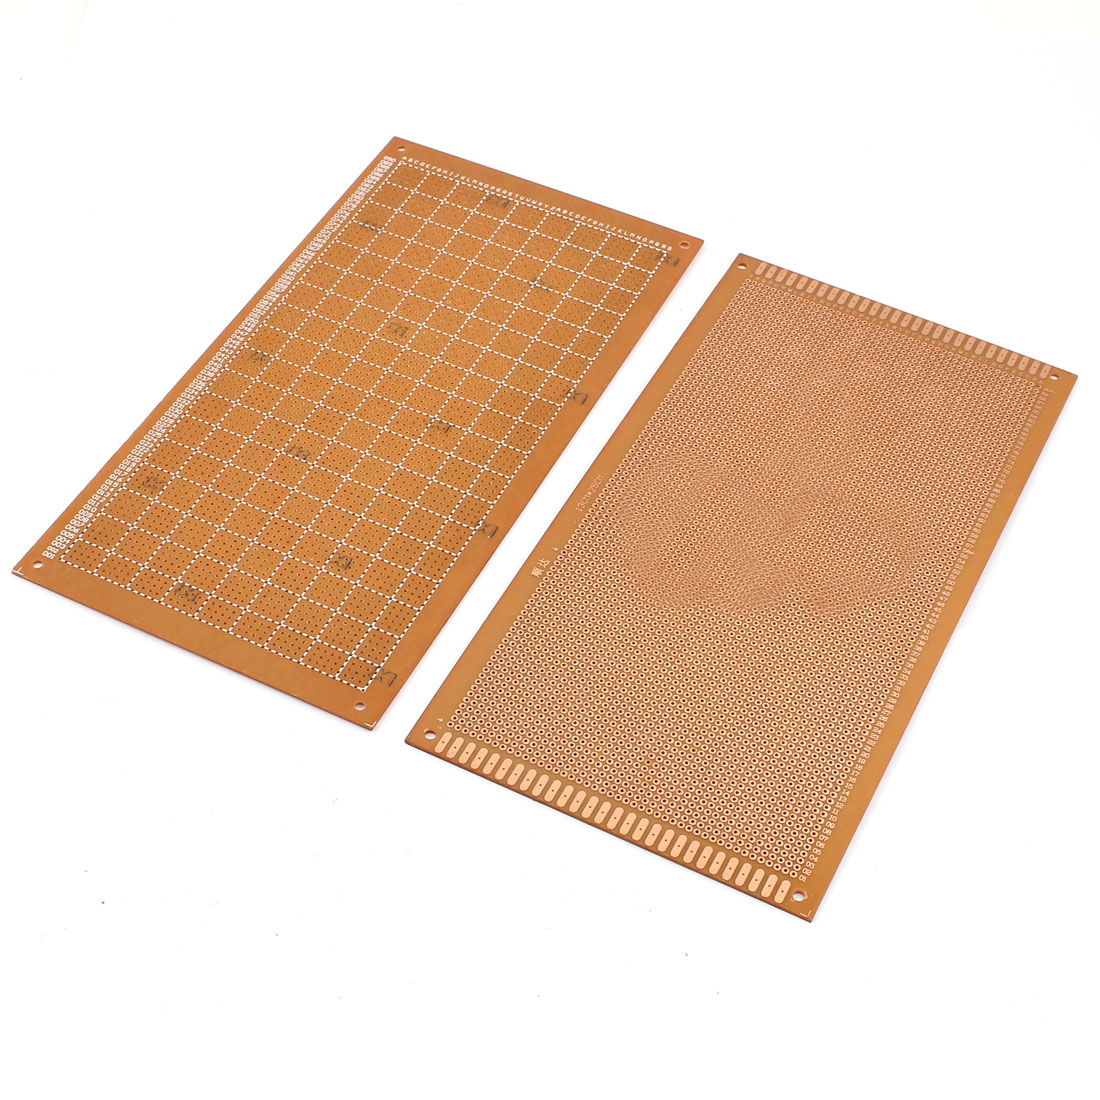 2Pcs 13 x 25cm Electronic DIY Prototype Paper Single Side PCB Board